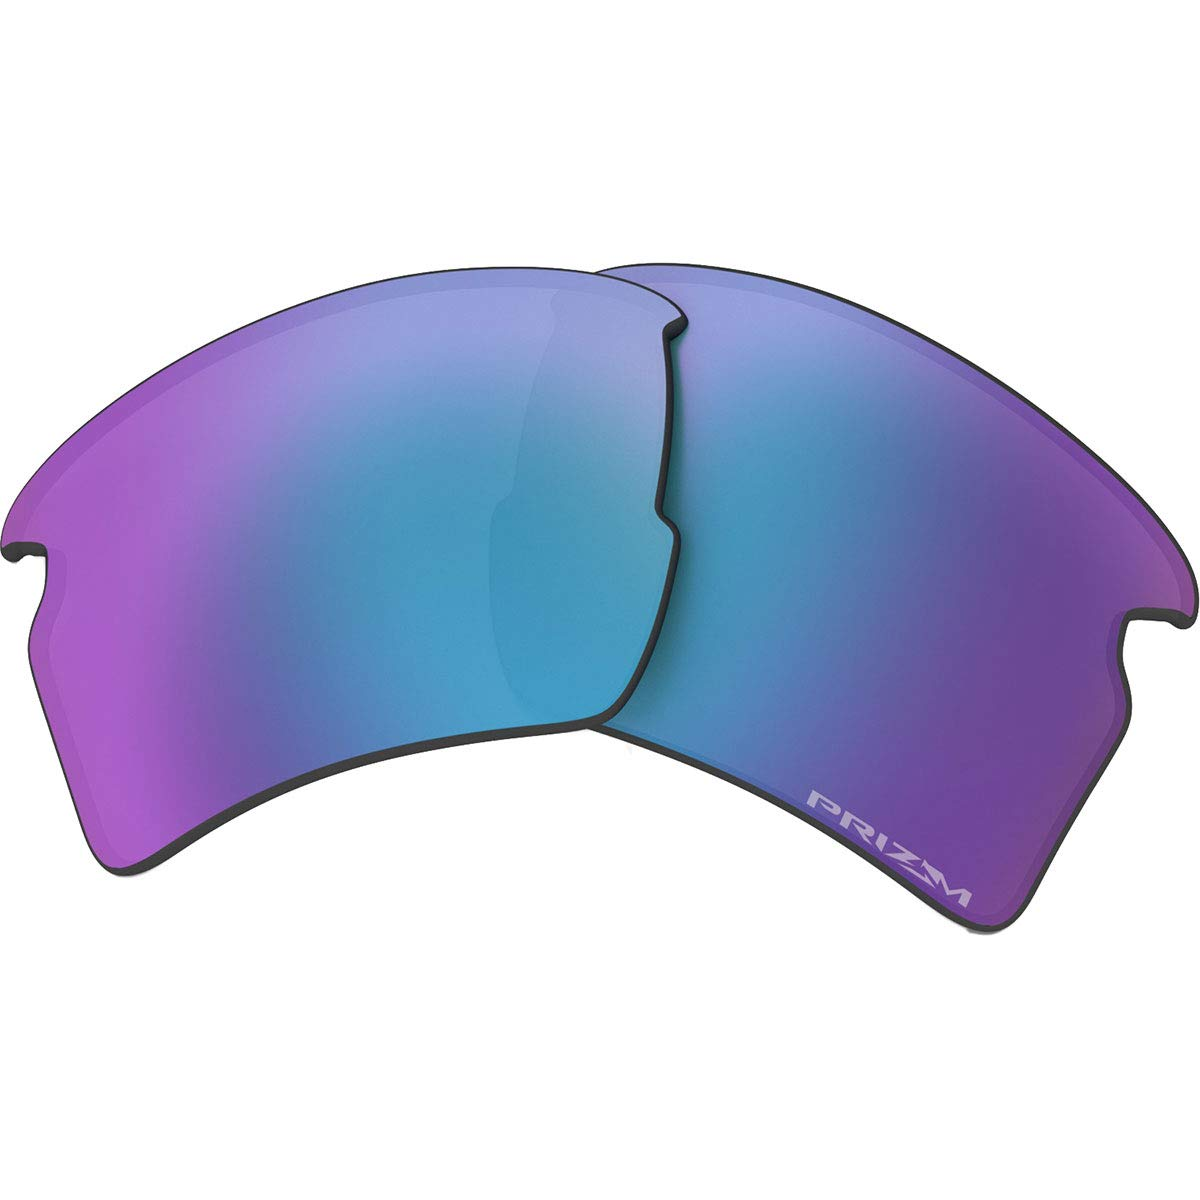 Oakley Flak 2.0 XL ALK Replacement Lens Sunglass Accessories,One Size,Prizm Sapphire Polarized by Oakley